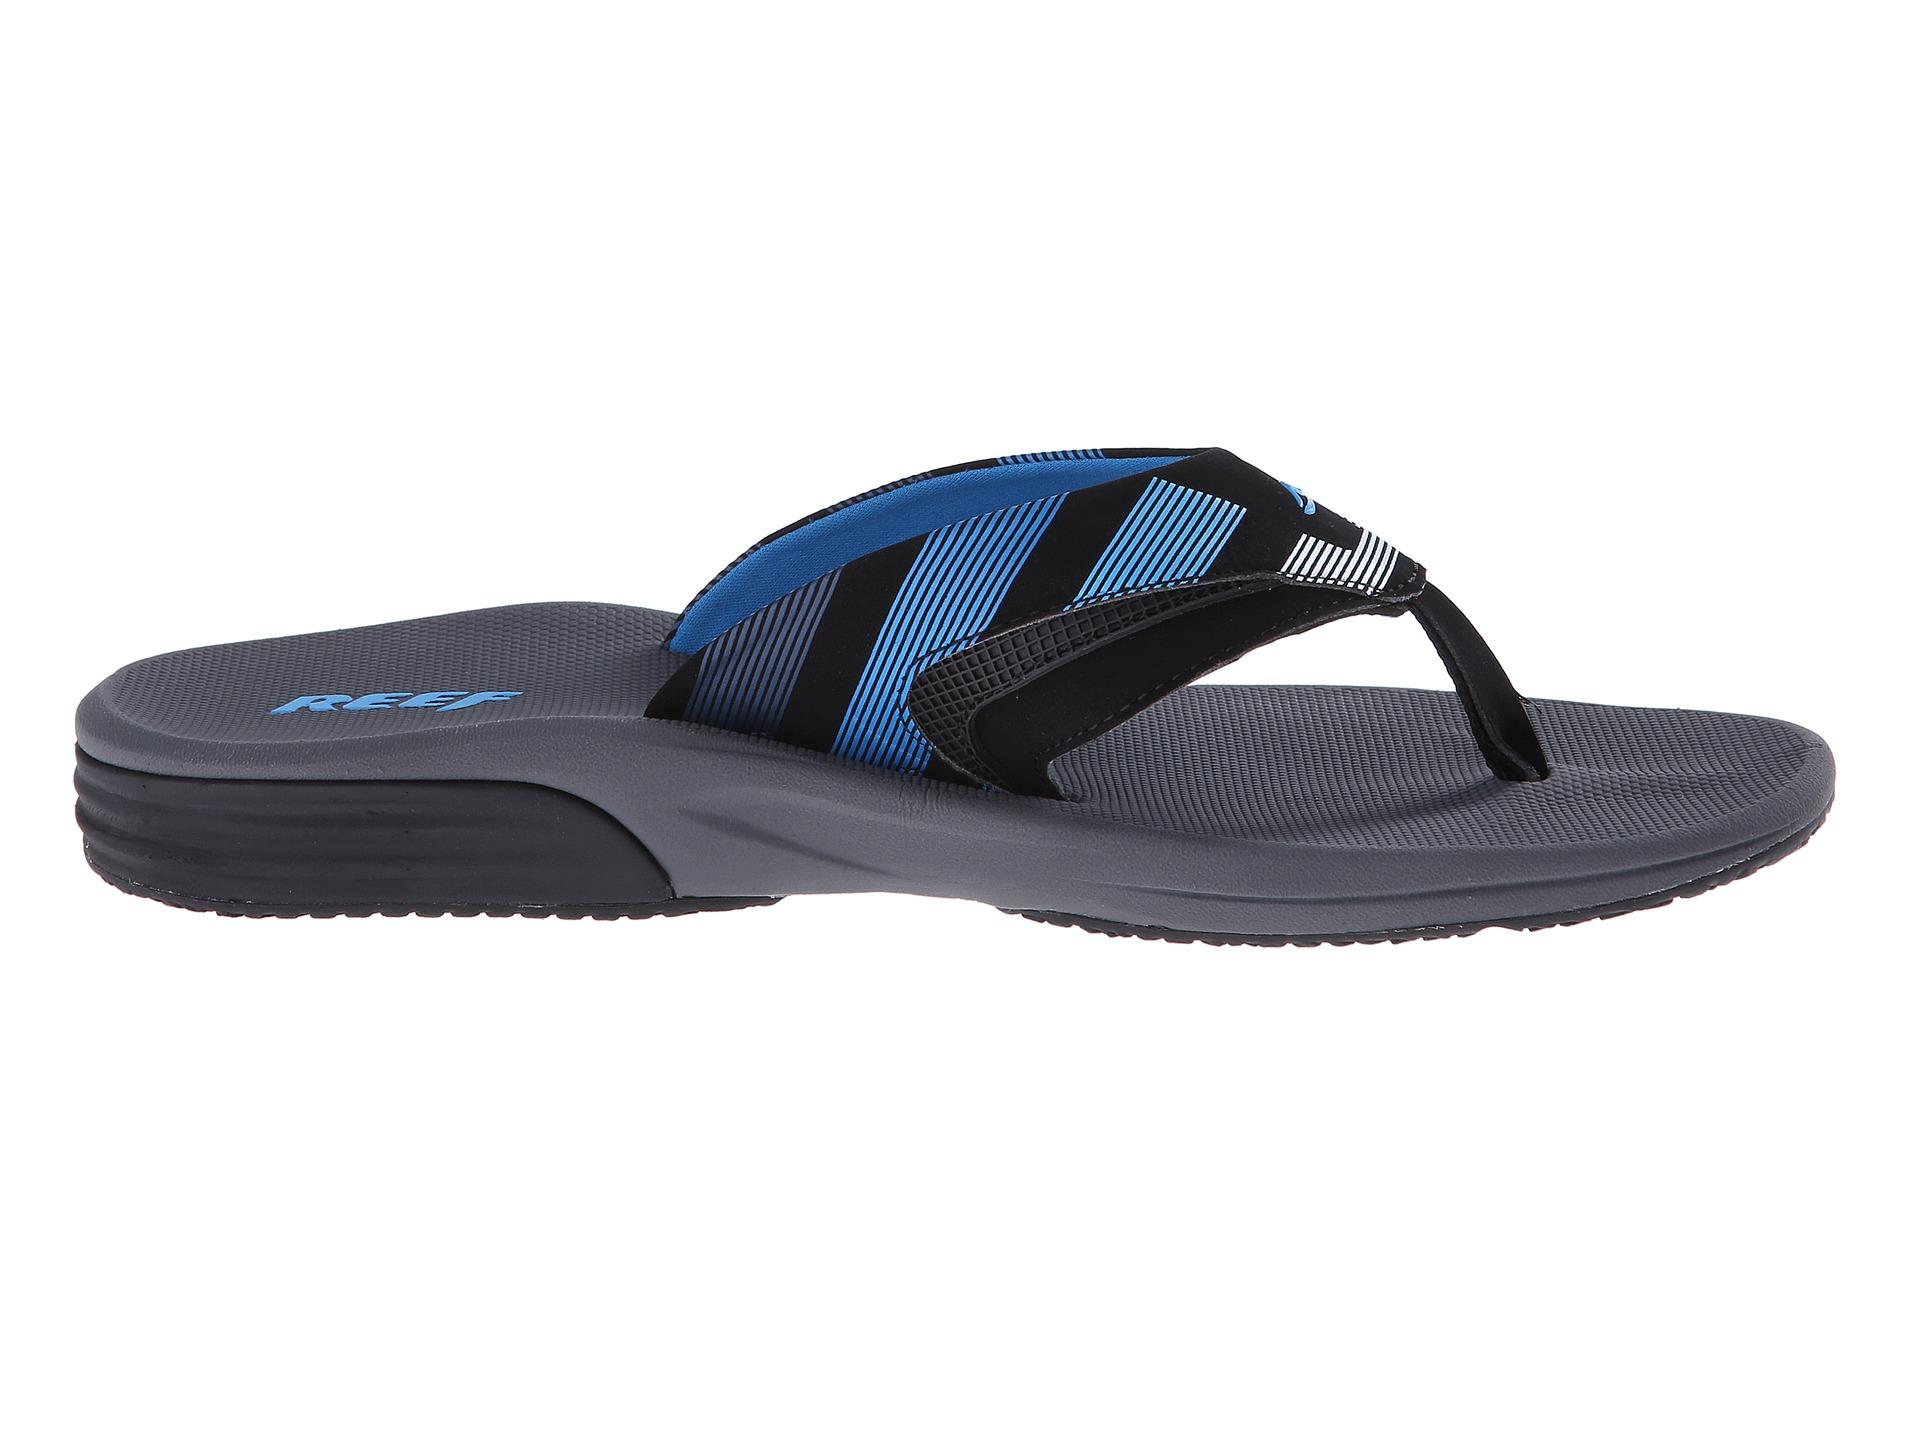 a567b5472e22 Lyst reef phantom player prints in blue for men jpg 1920x1440 Mens reef  phantom player sandal